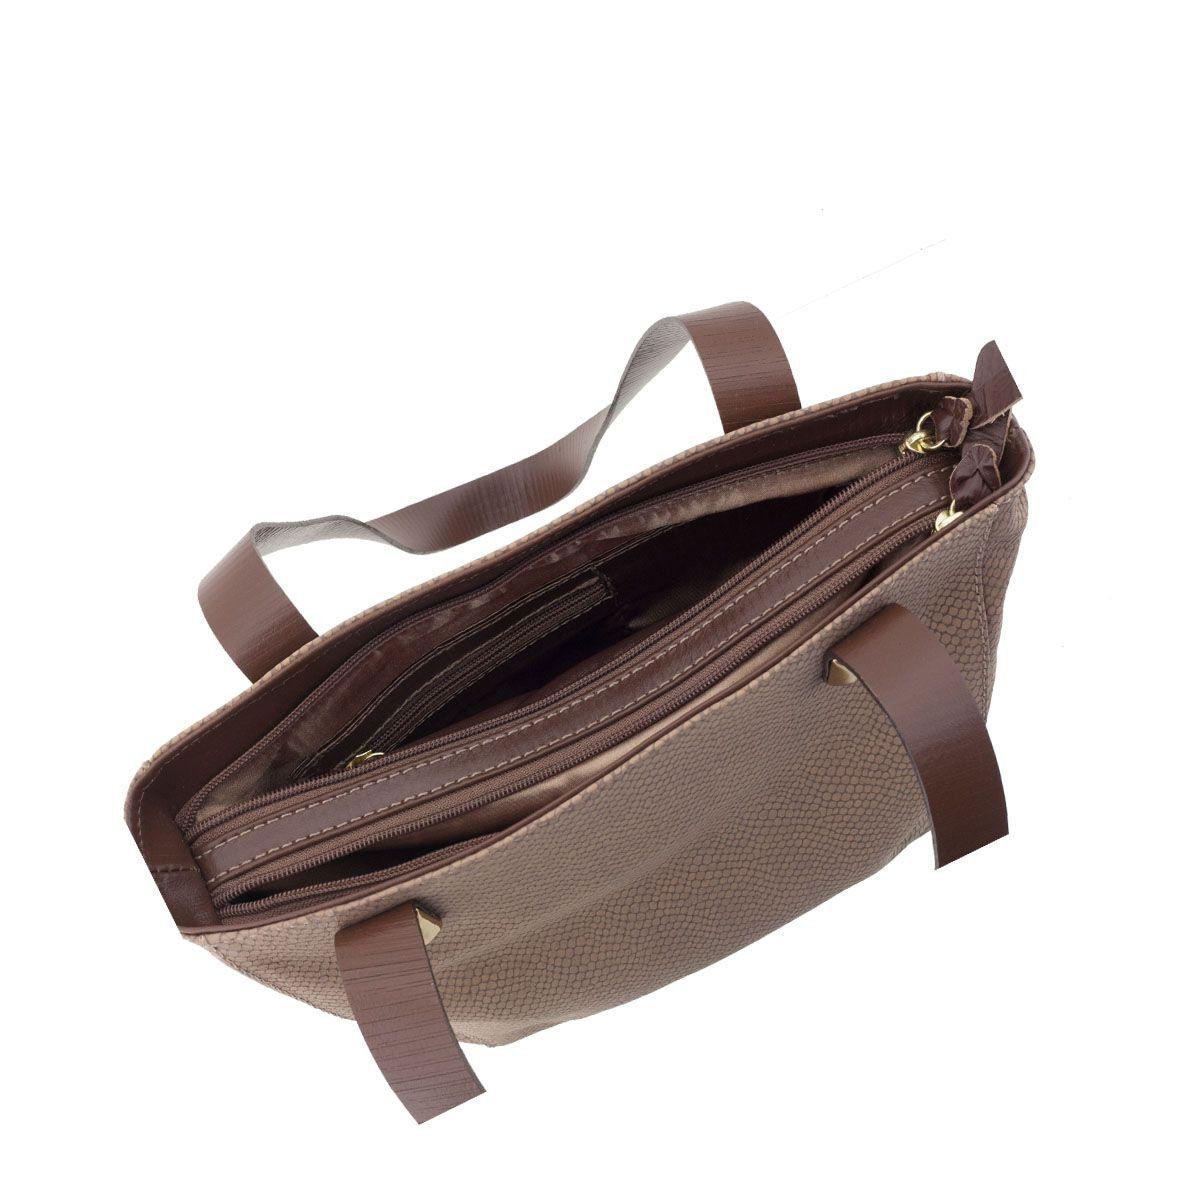 Bolsa de Couro Legitimo Chocolate